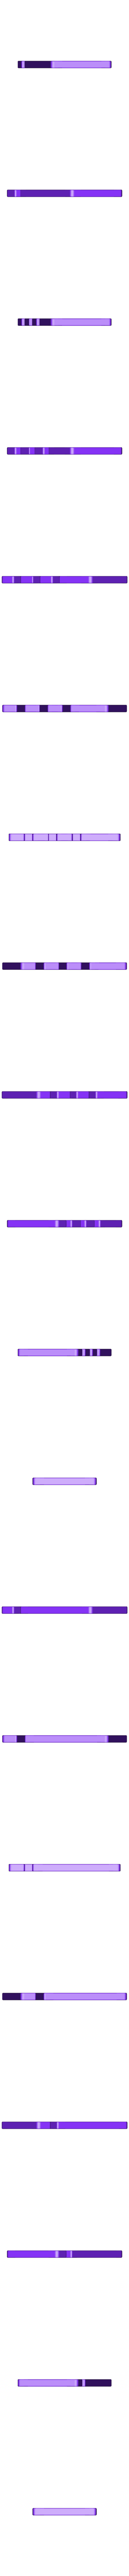 part5x2.stl Download free STL file The lattice puzzle • 3D printing object, dancingchicken